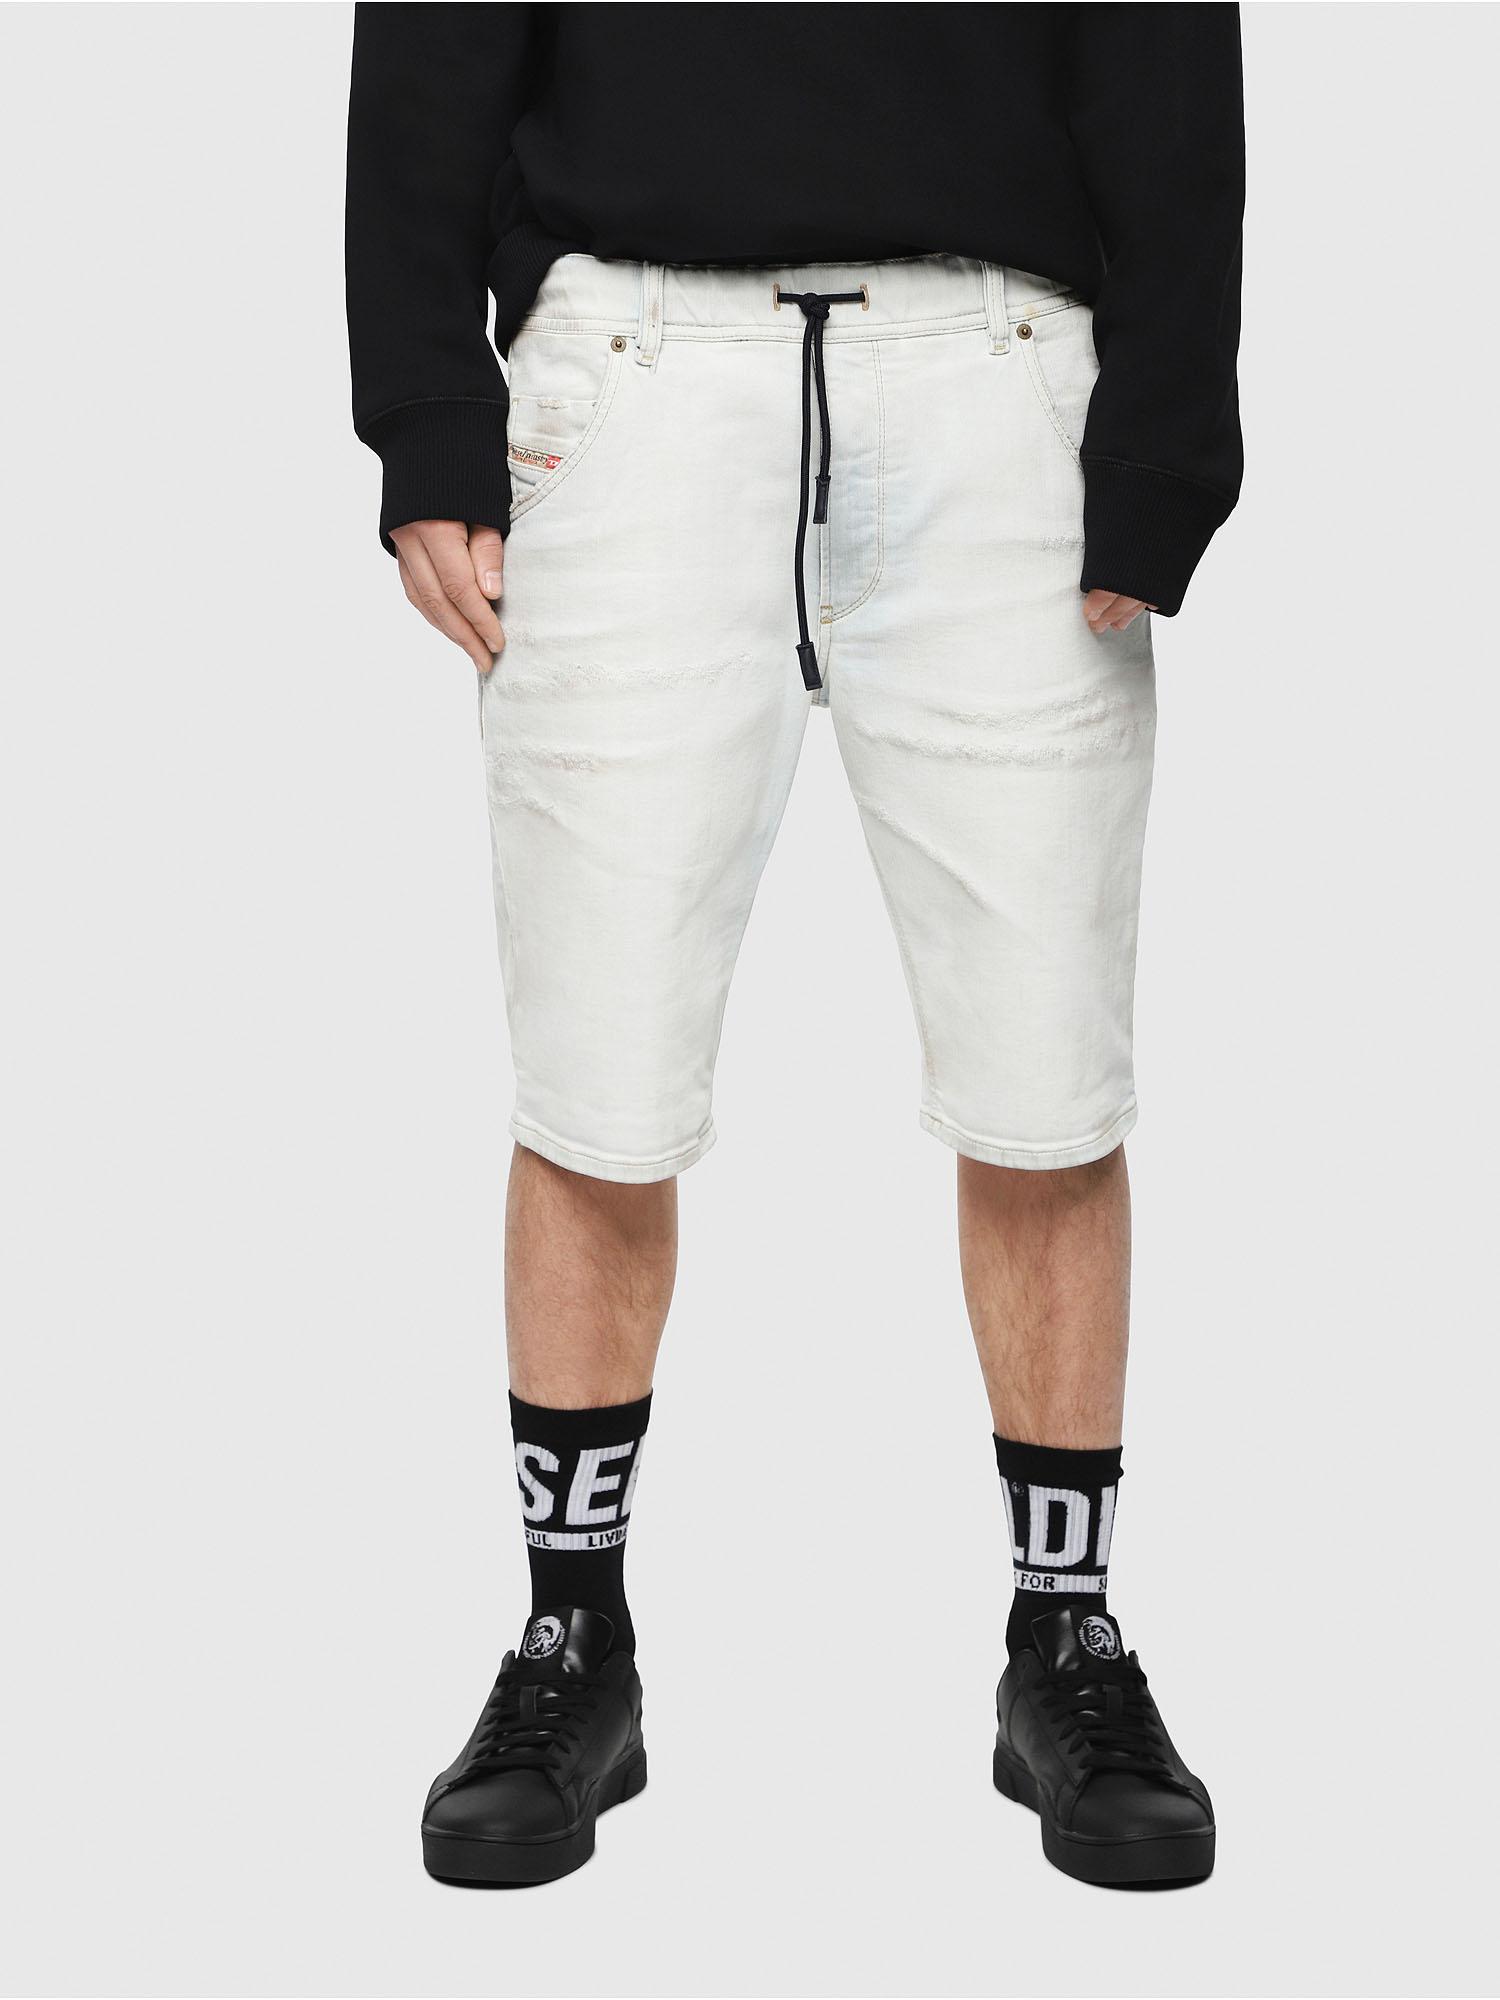 3e41152b300aa D-KROOSHORT-T Homme: Short en JoggJeans vieilli | Diesel